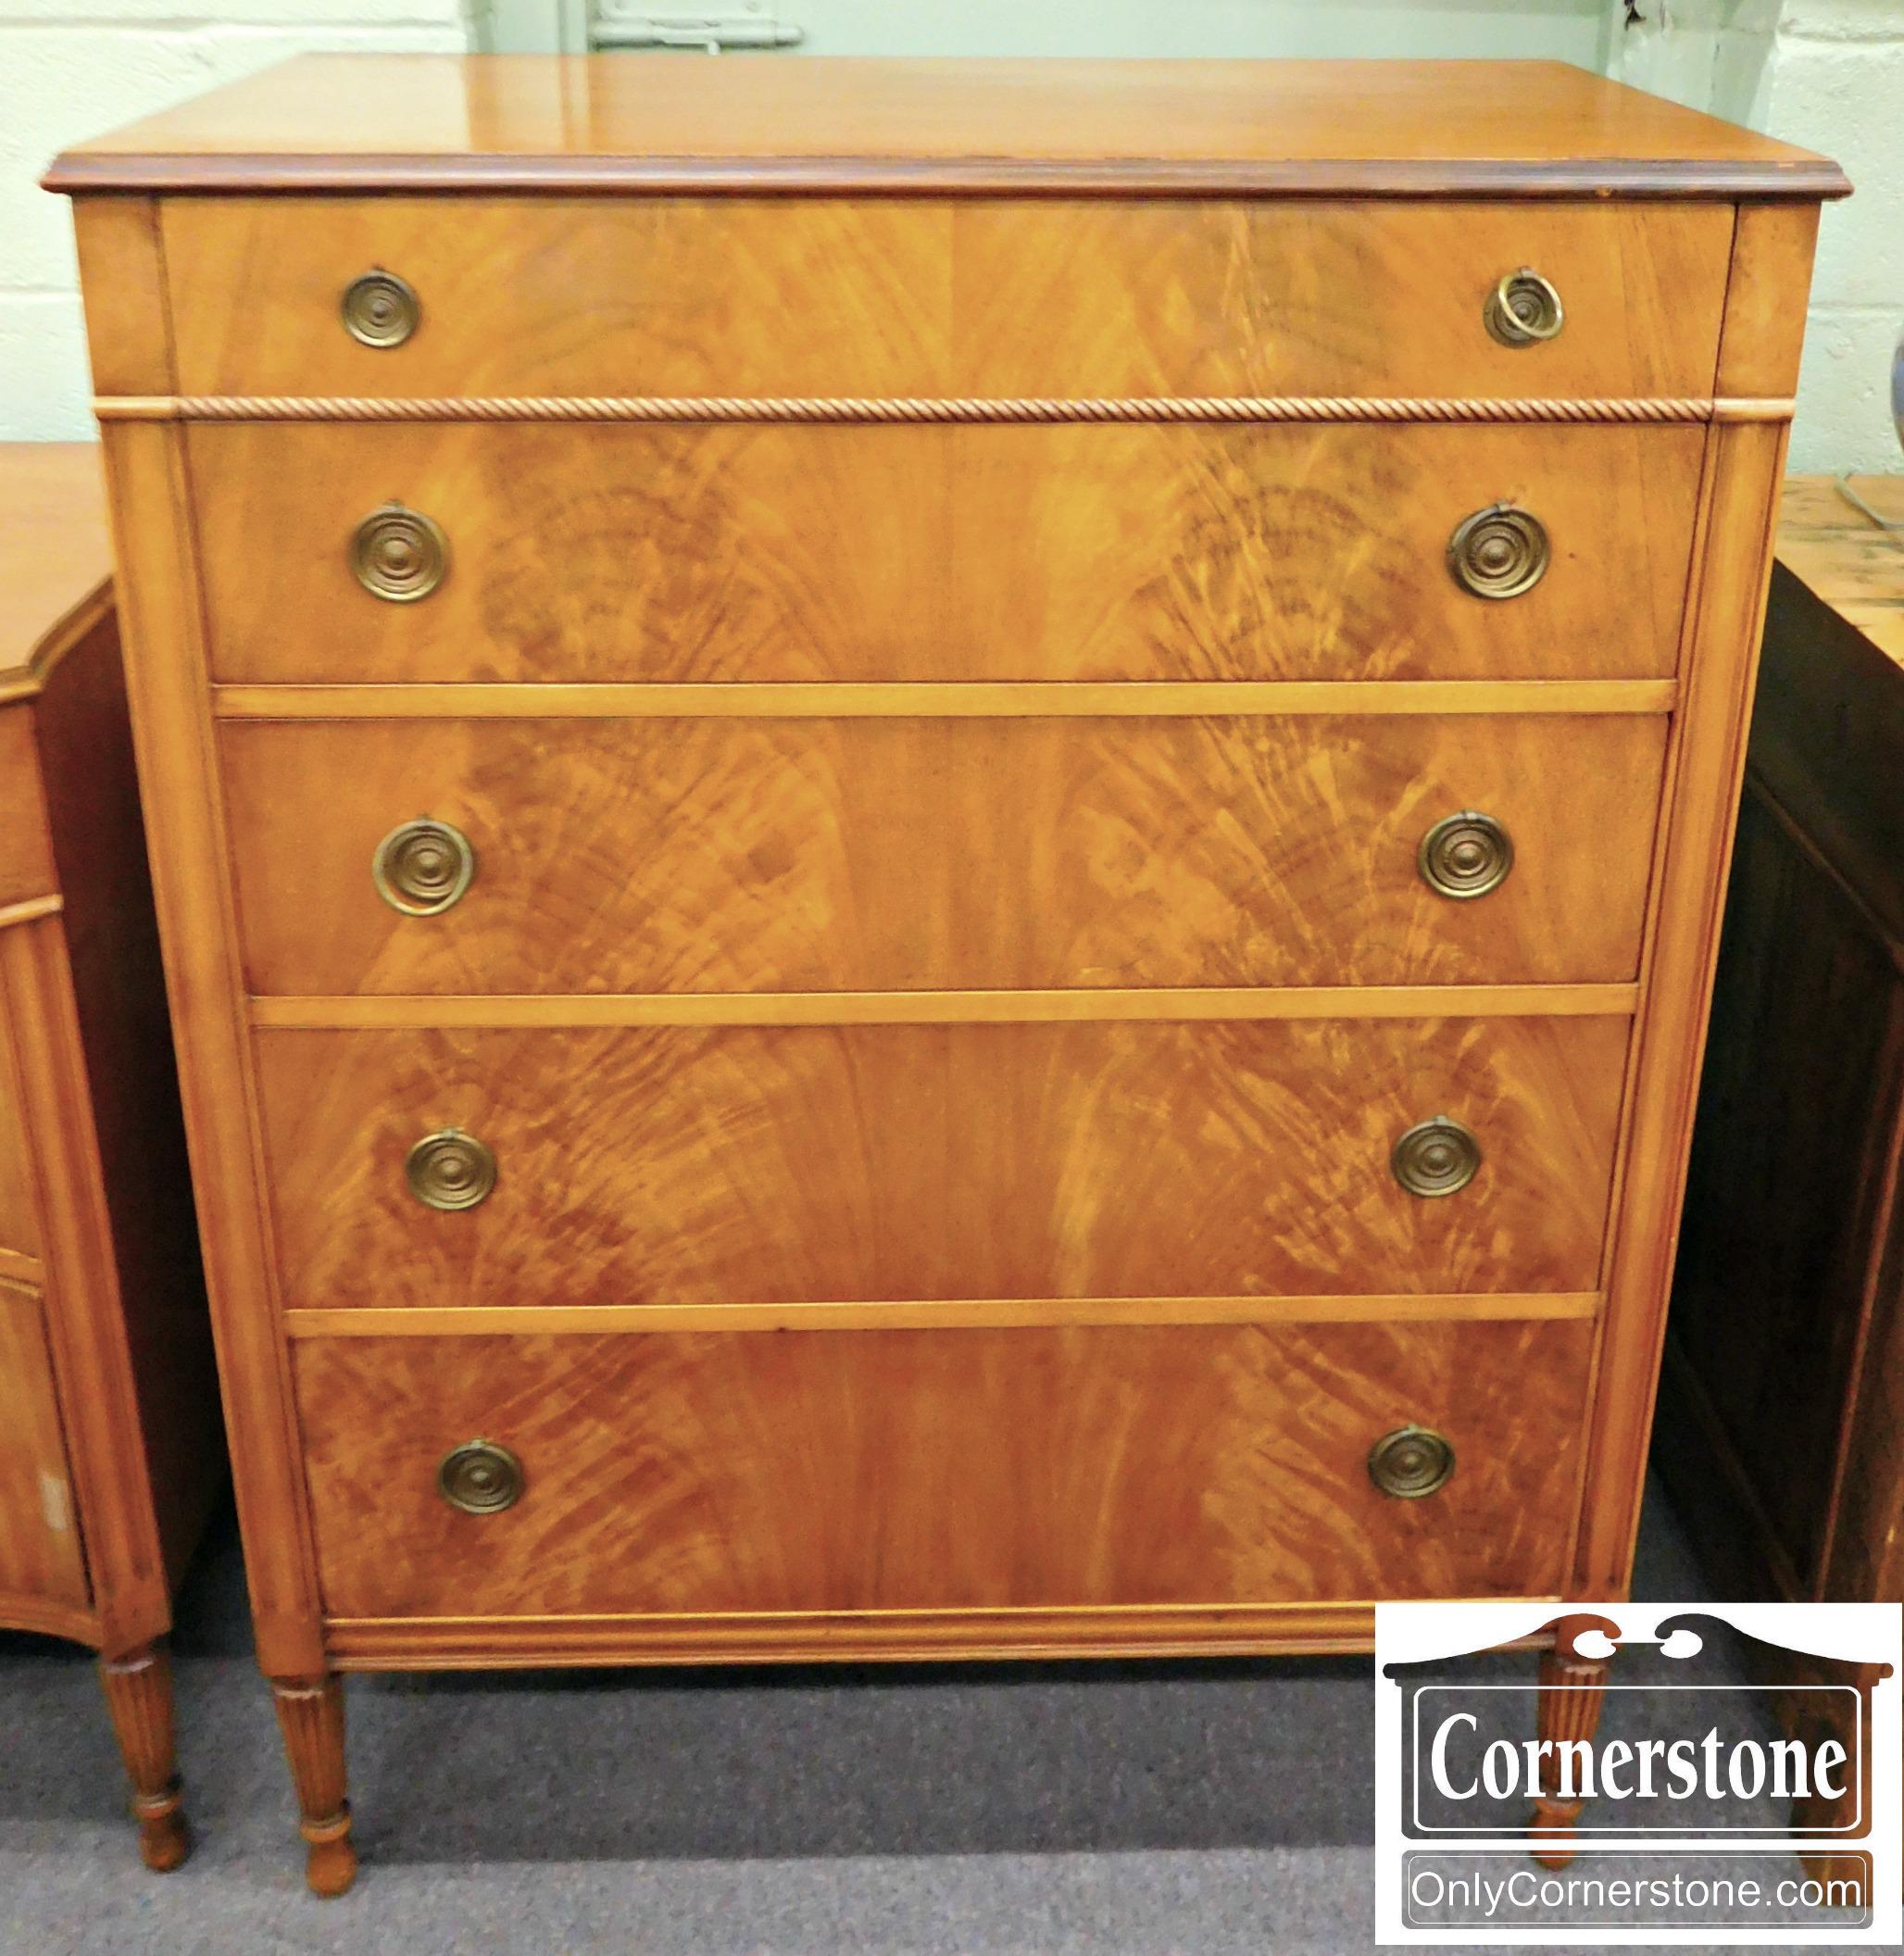 Chests Dressers Baltimore Maryland Furniture Store Cornerstone